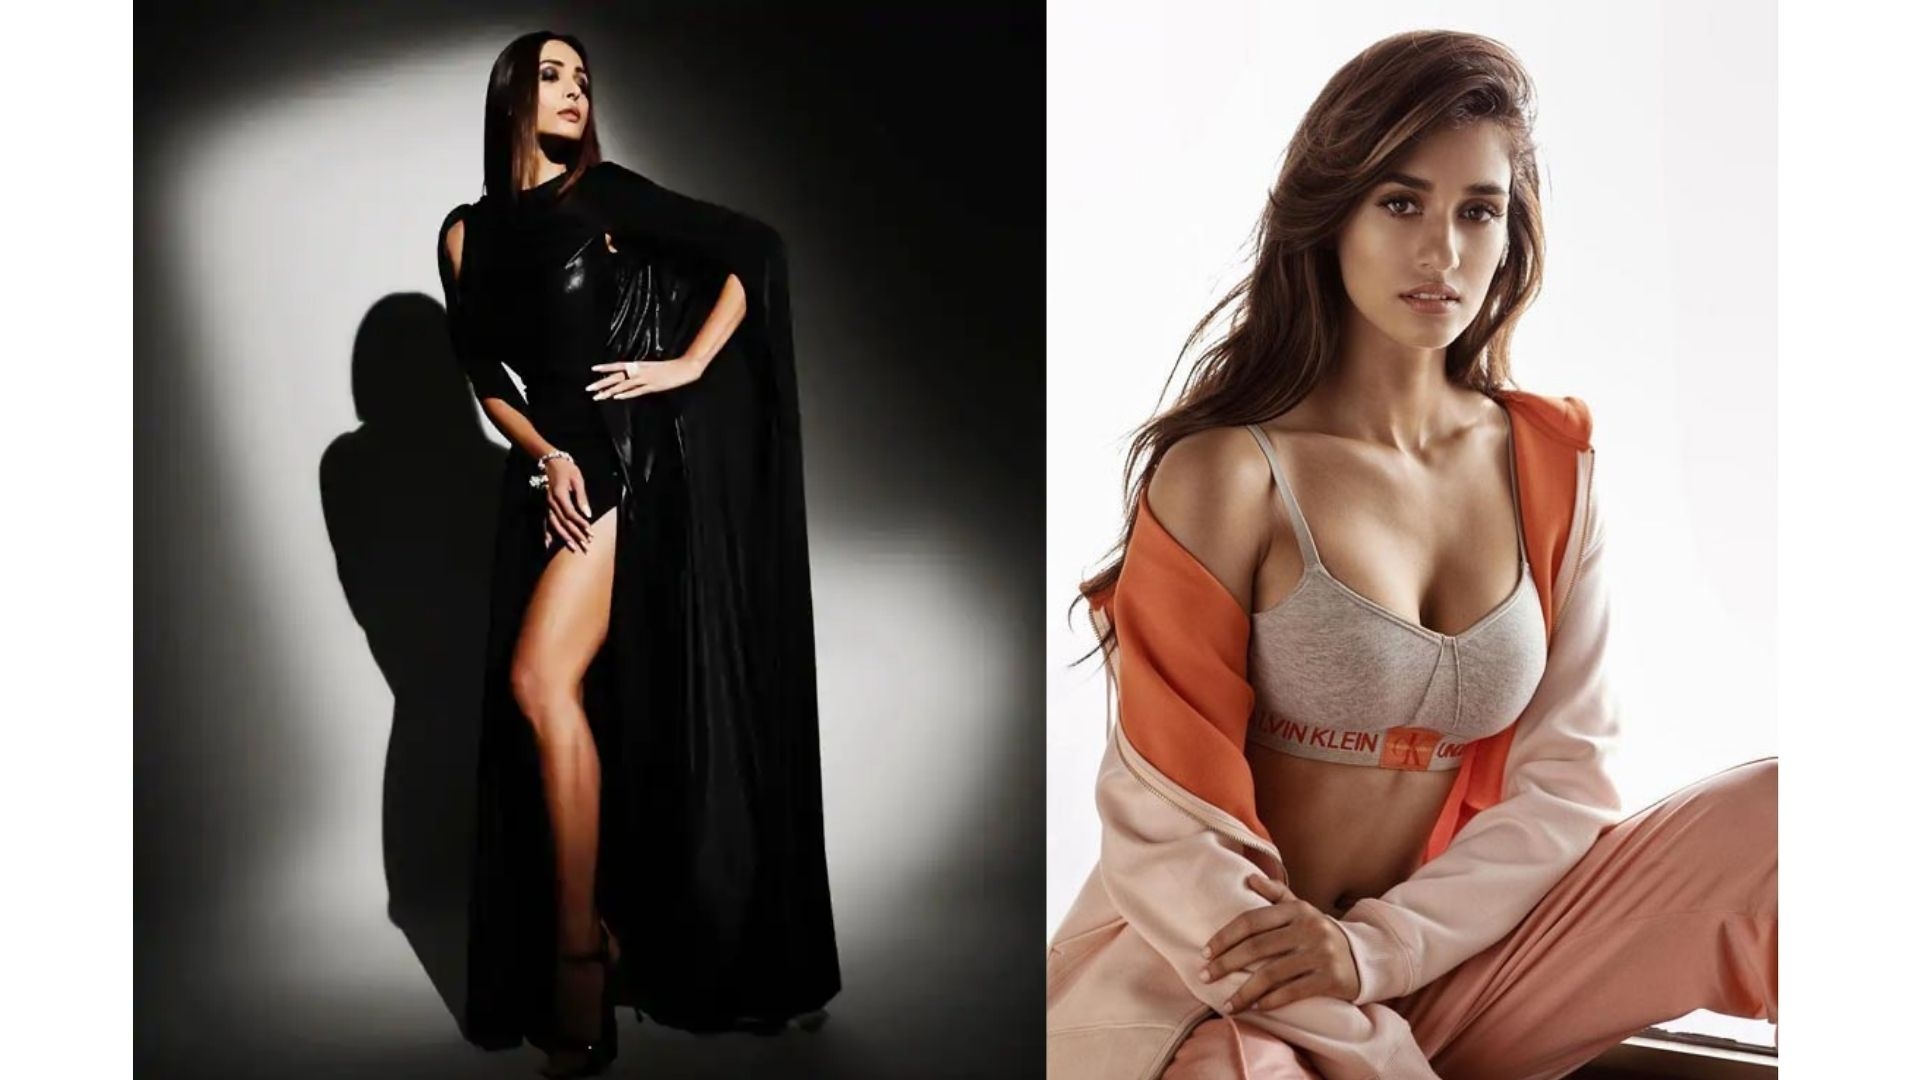 Malaika Arora To Disha Patani- Actors Who Got Badly Trolled For Their Fashion Sense